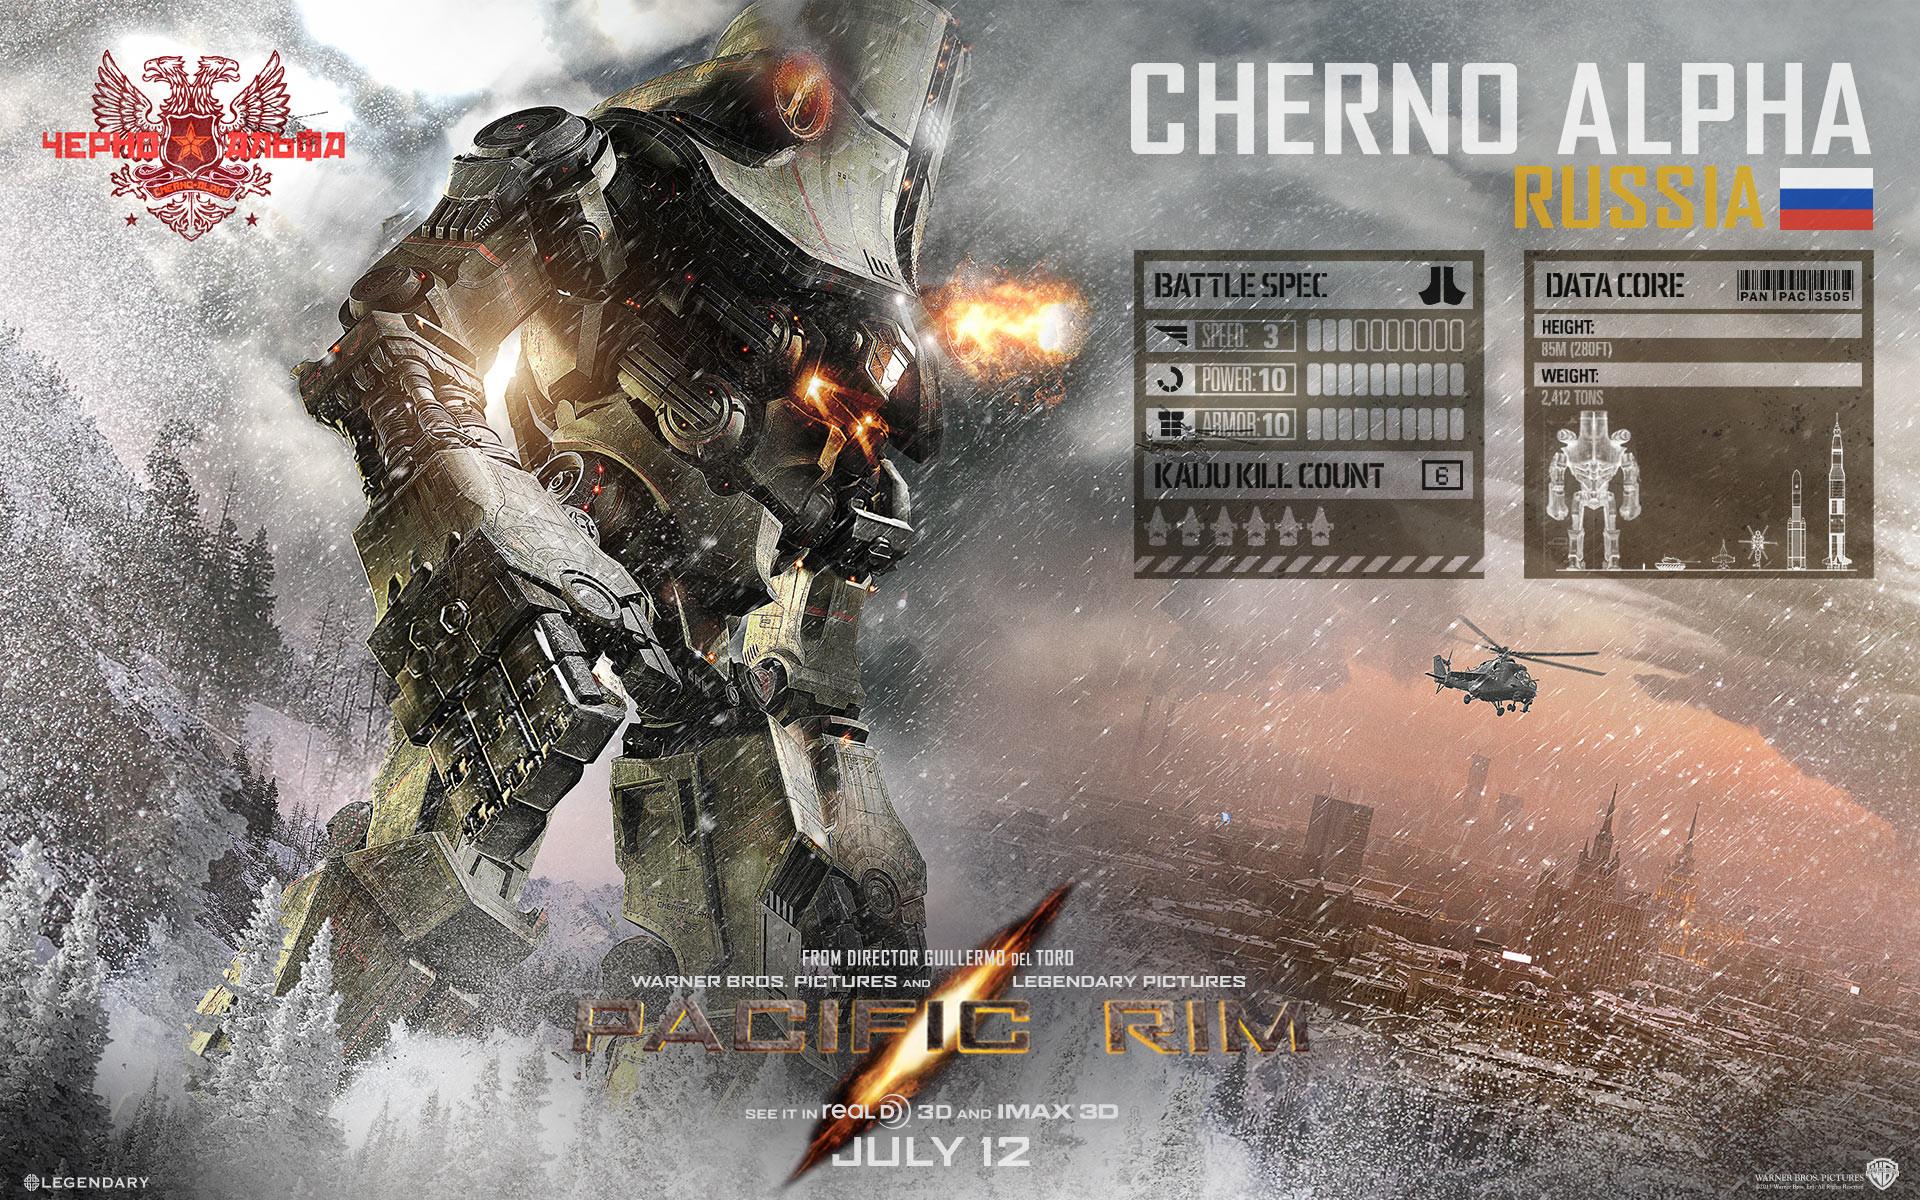 Pacific Rim Giant Robot Cherno Alpha mecha sci-fi ...